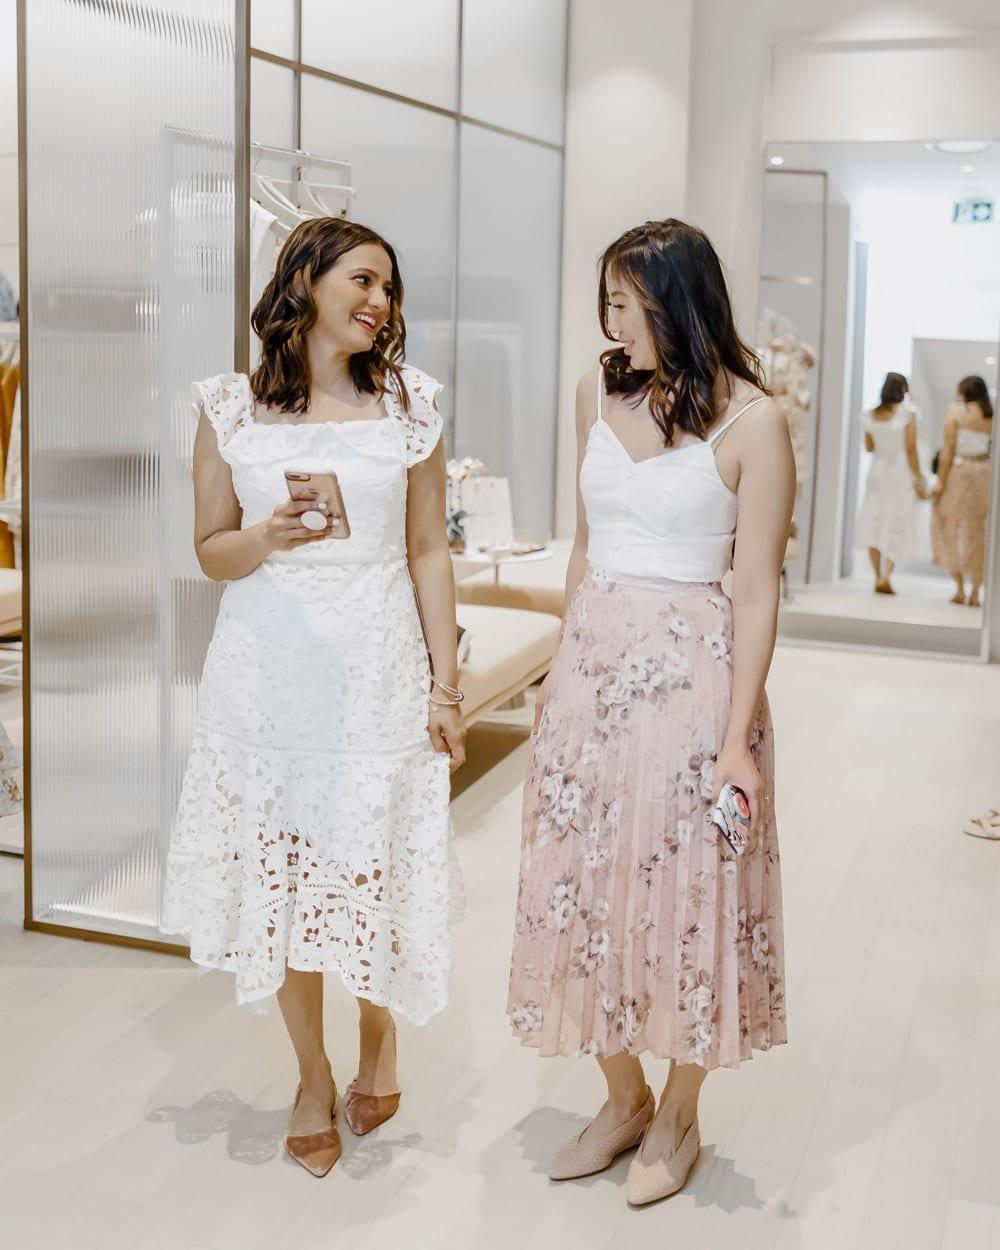 Evernew store opening at Square One - Toronto Fashion bloggers YesMissy EllaPrettyBlog